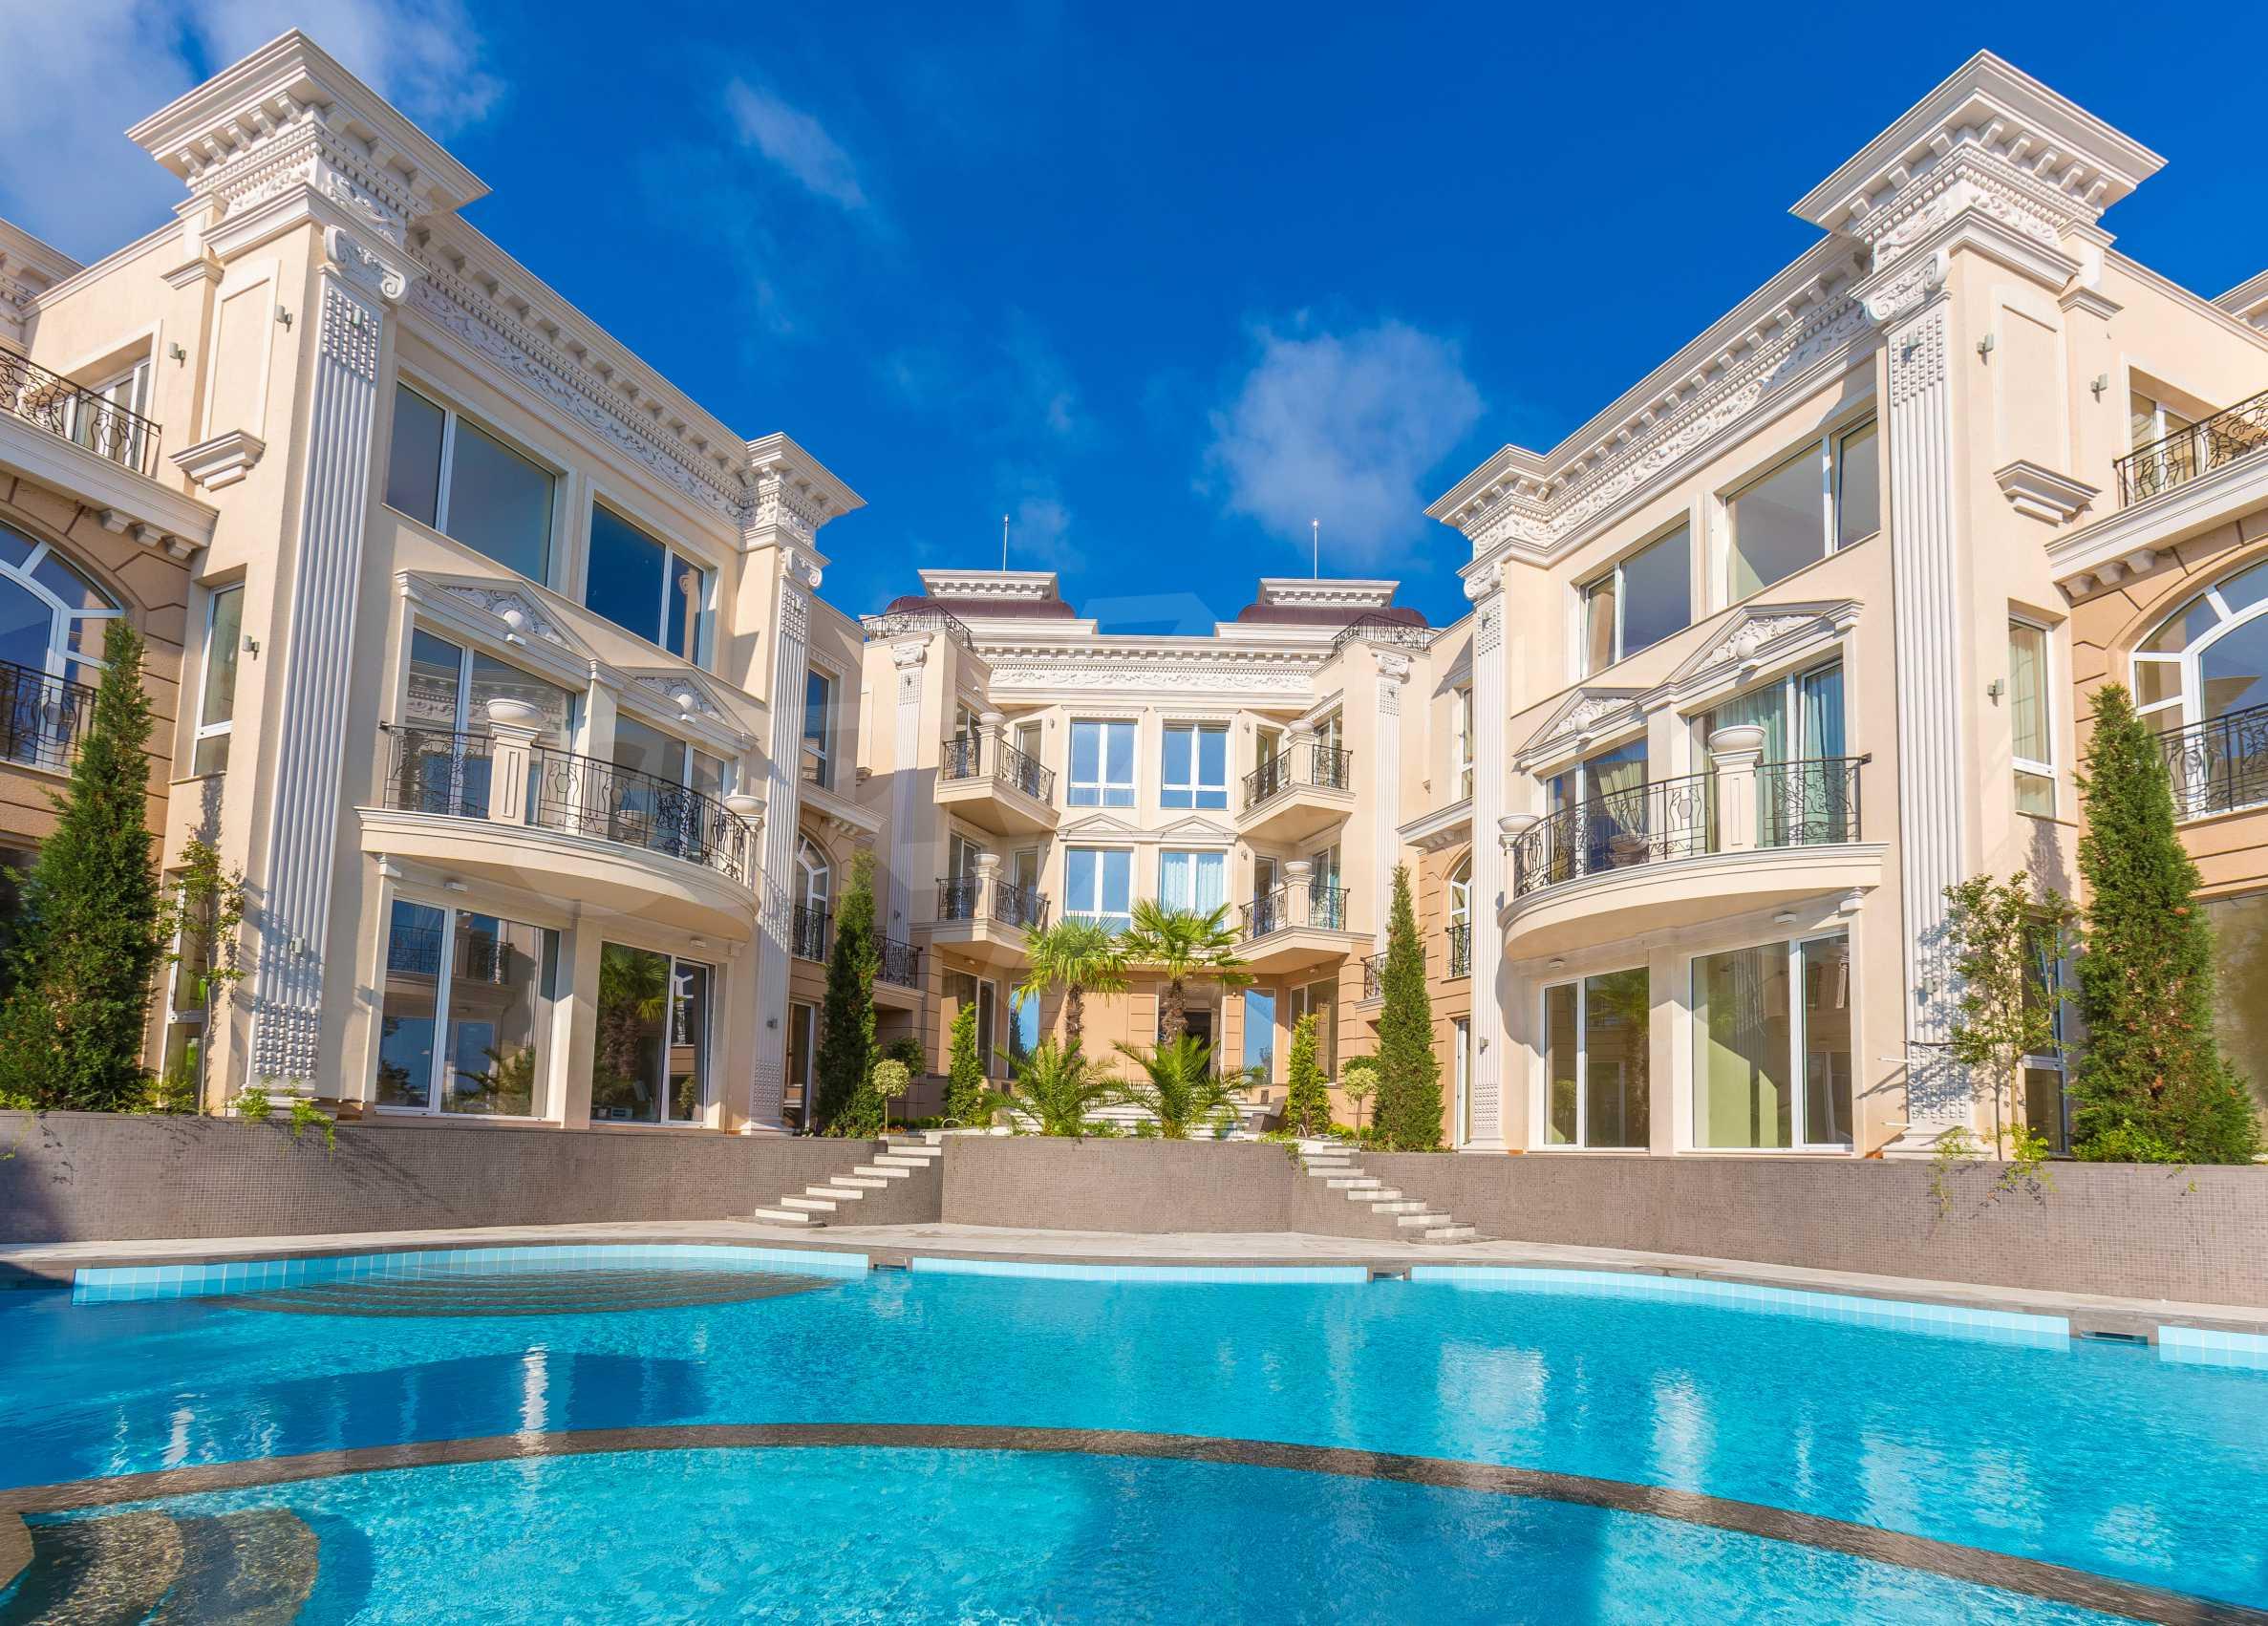 Дизайнерски тристаен апартамент под наем за летен сезон в резиденция Belle Époque в Лозенец 36